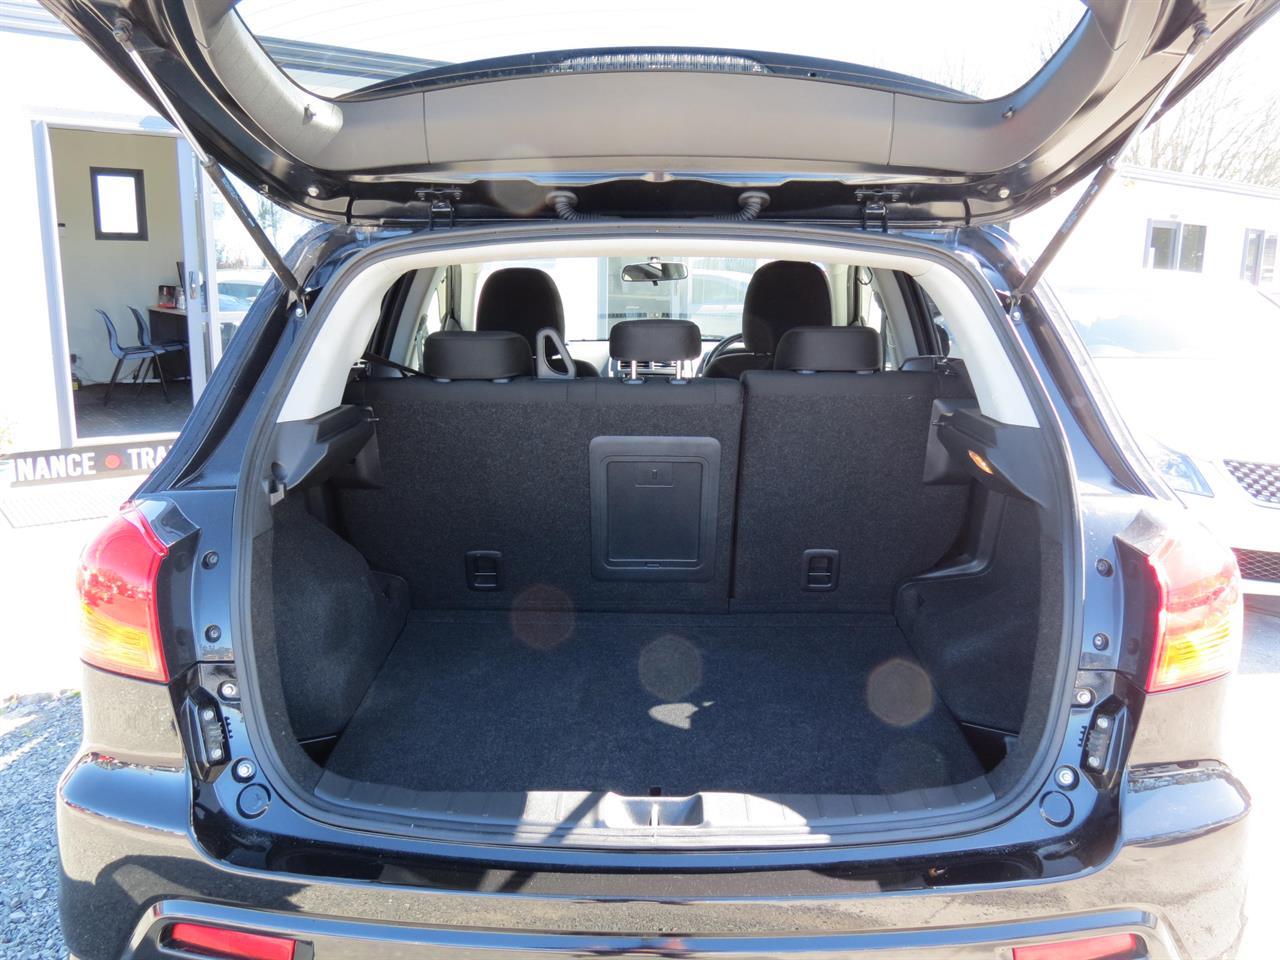 2011 Mitsubishi RVR | only $51 weekly